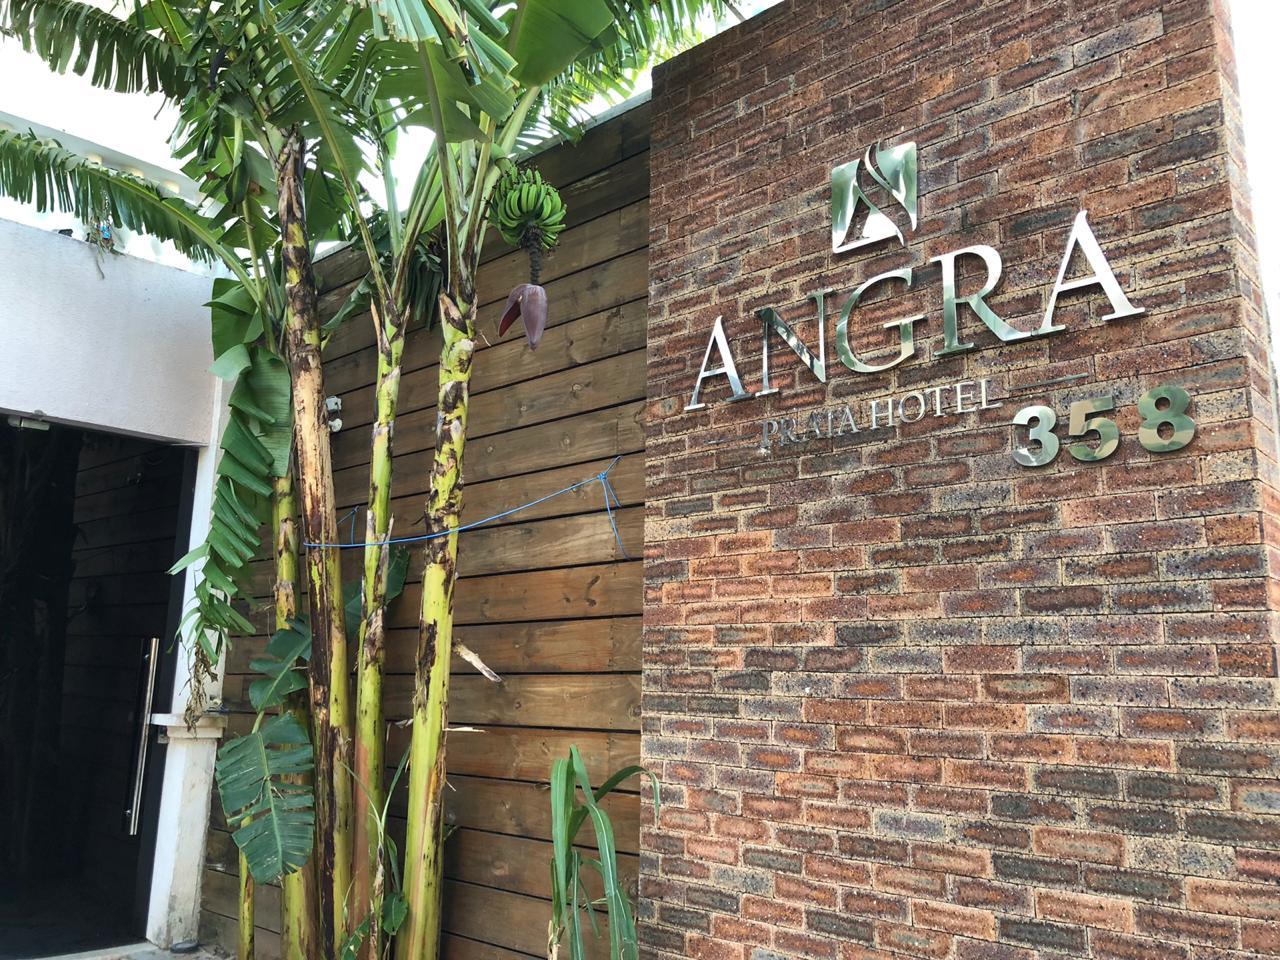 Angra Praia Hotel, Fortaleza